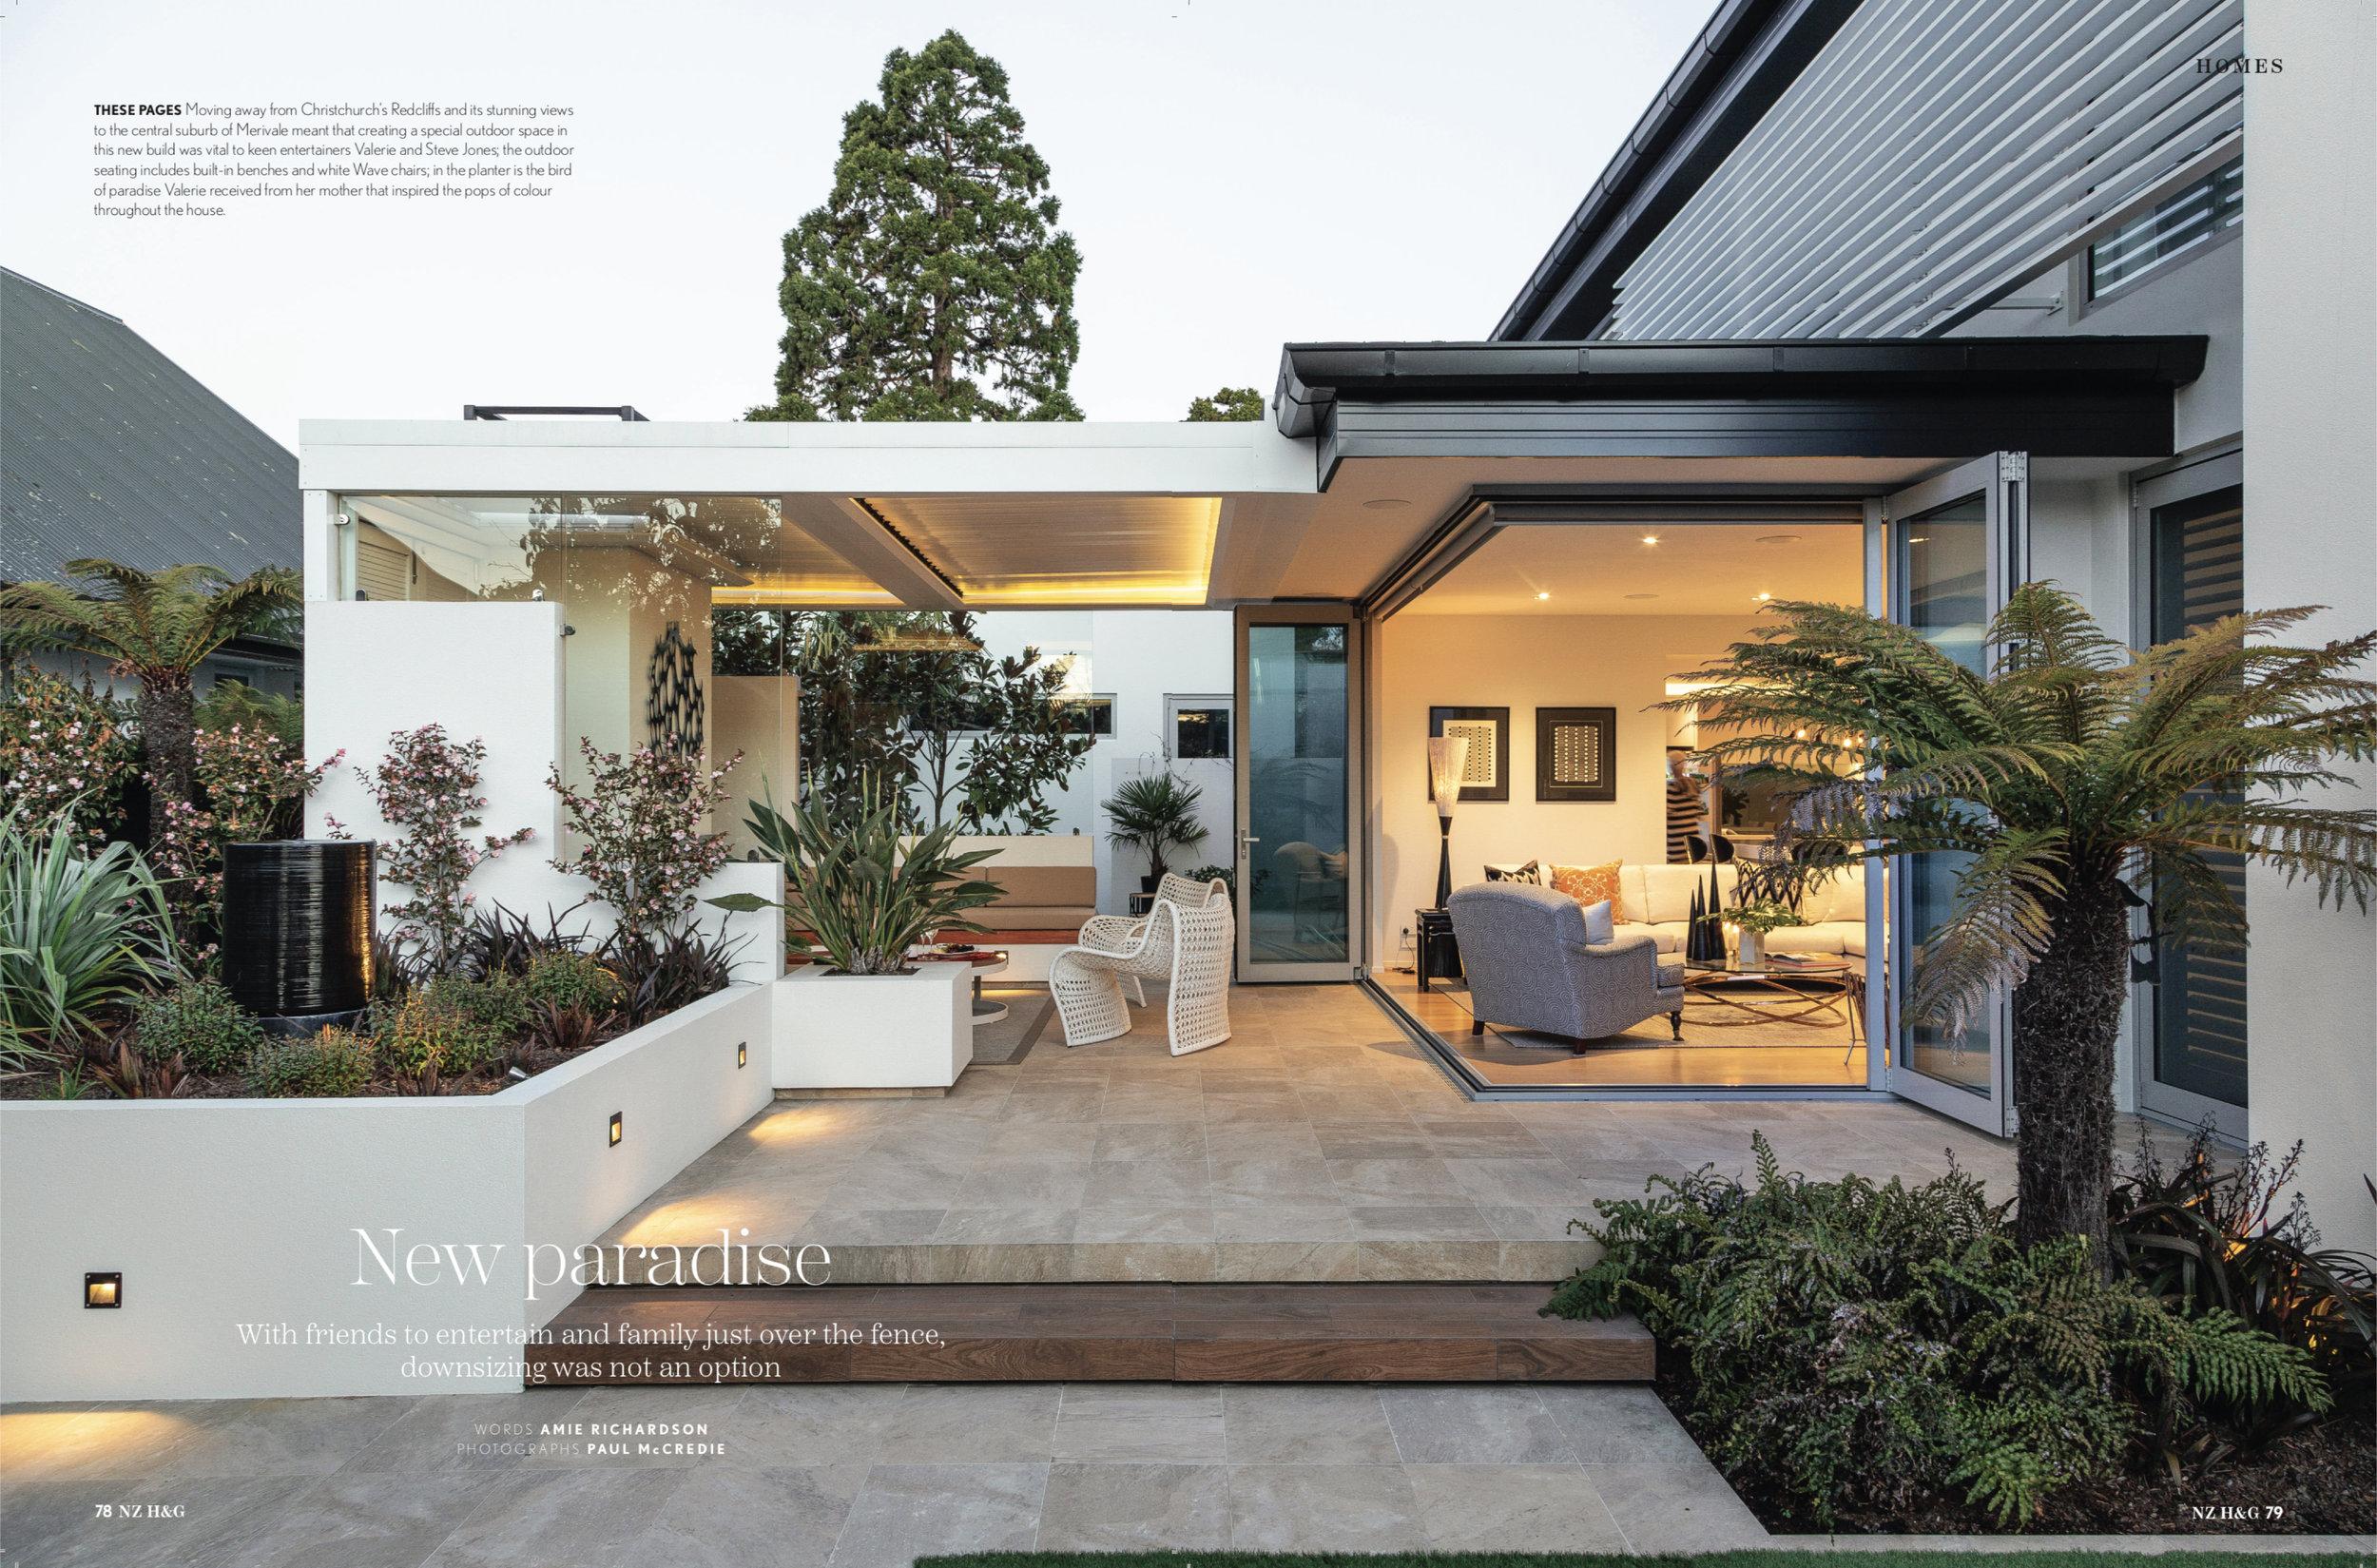 NZHG Fendalton House Feature p1&2.jpg